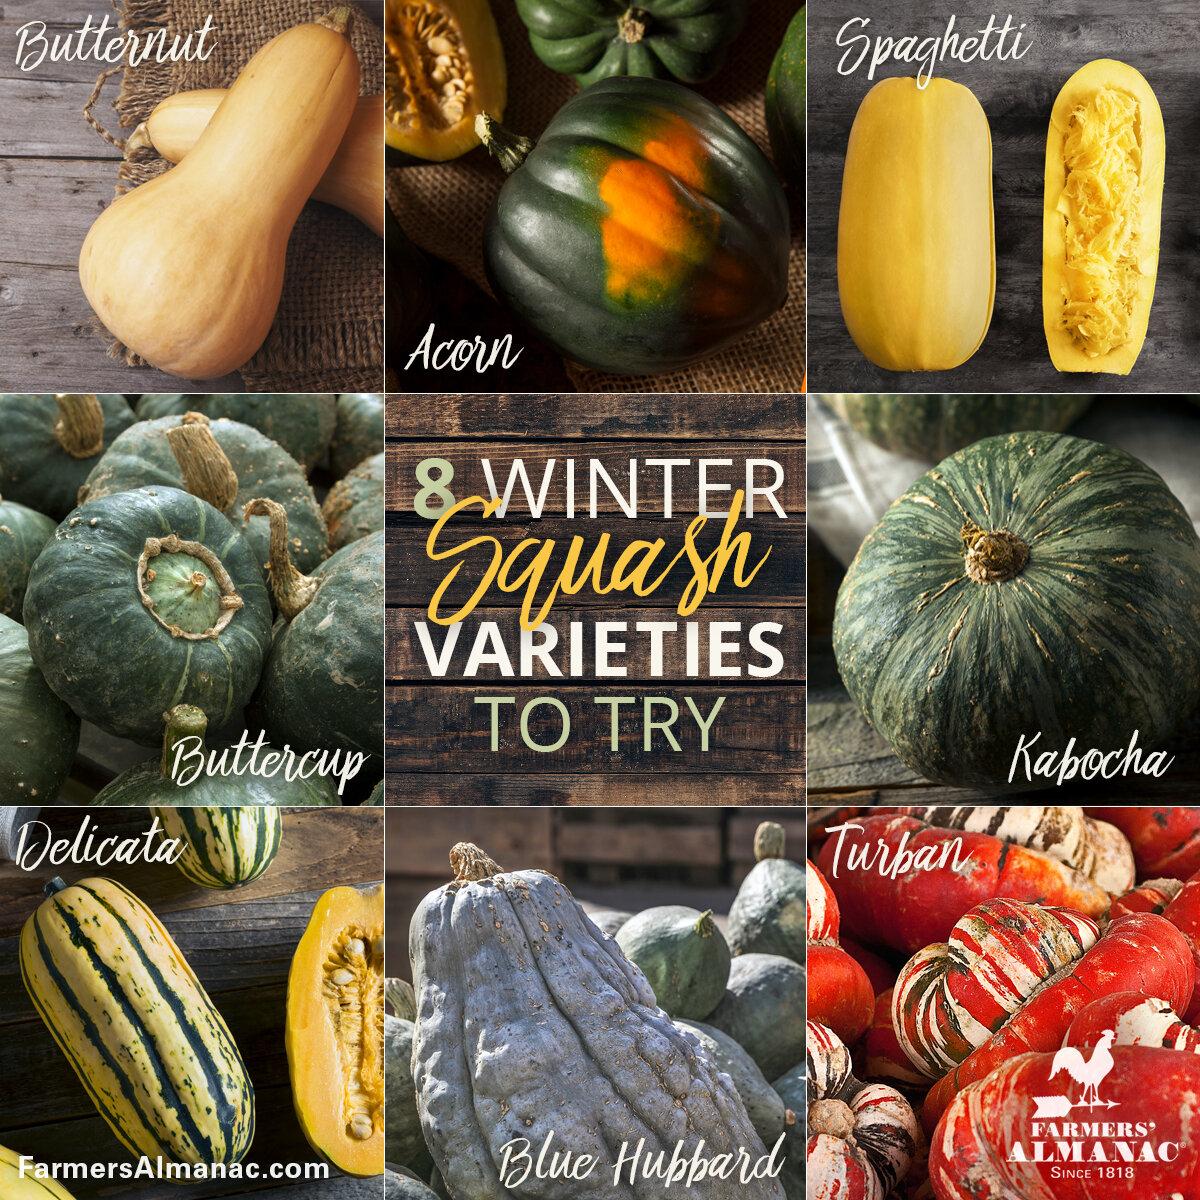 Winter squash comes in so many amazing colors! (Image: Farmers Almanac)